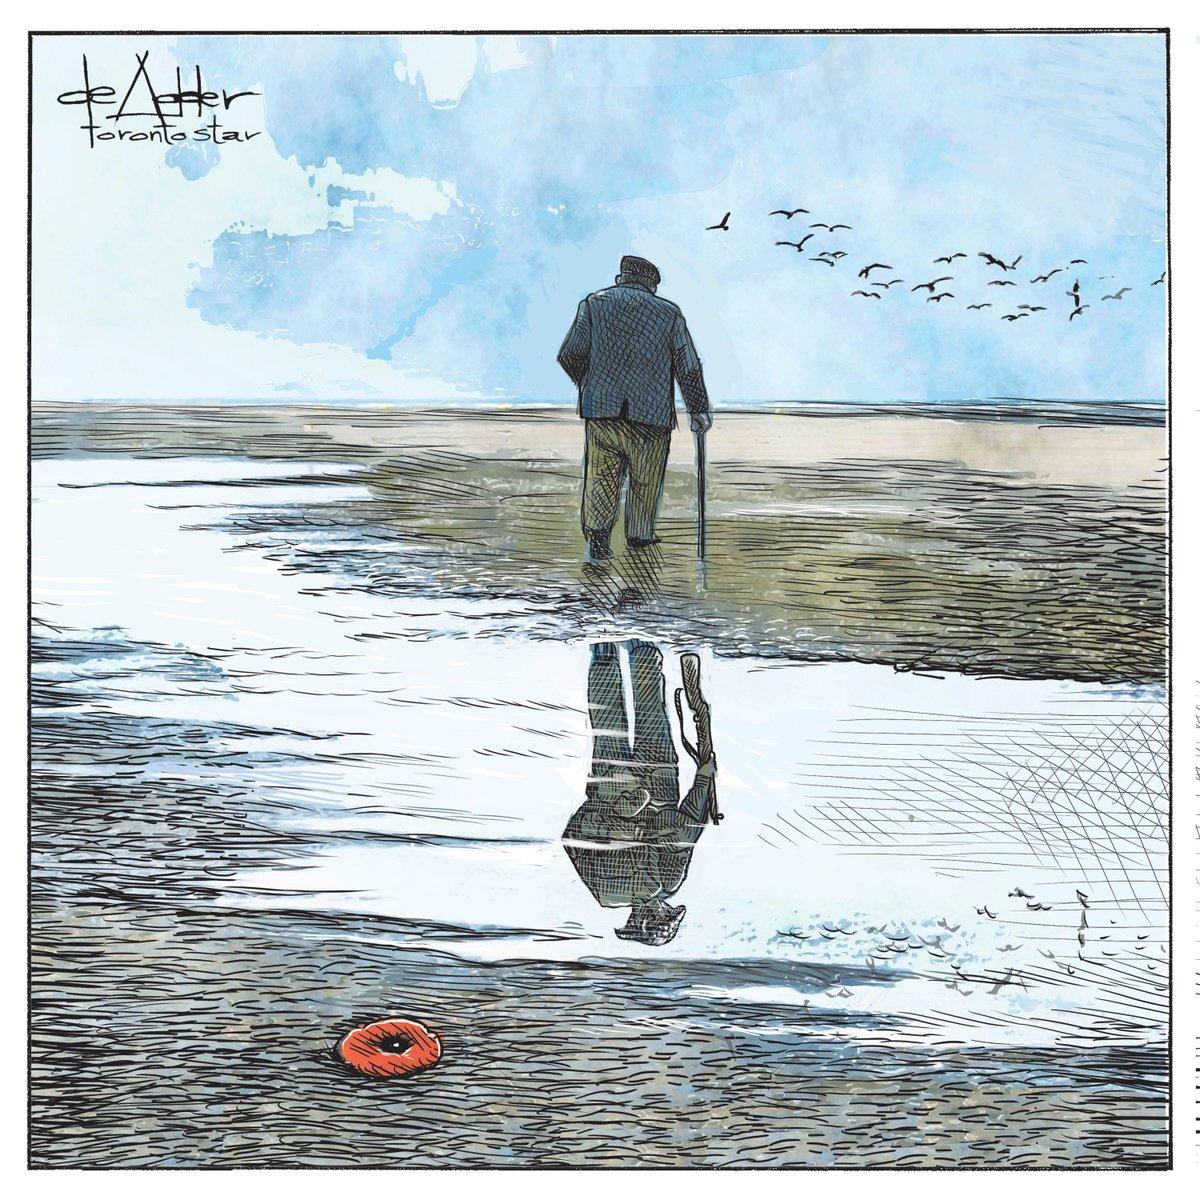 Cartoon for @TorontoStar #LestWeForget #RemembranceDay #RemembranceSunday #RemembranceDay2019 #VeteransDay